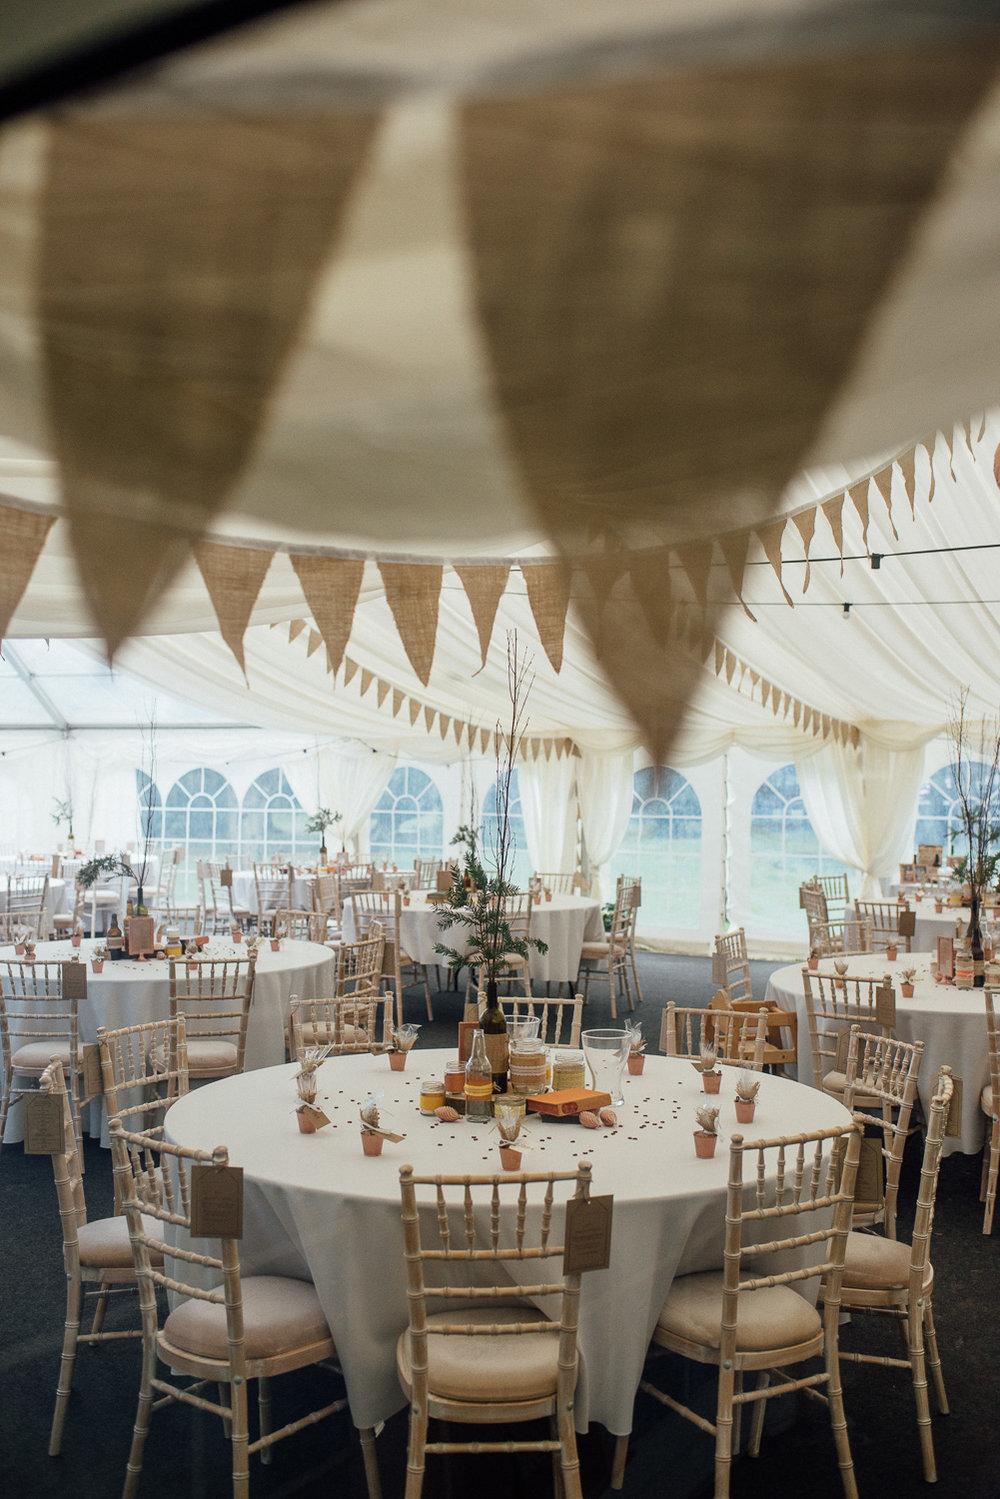 hayling-island-woodland-marquee-wedding-3.jpg